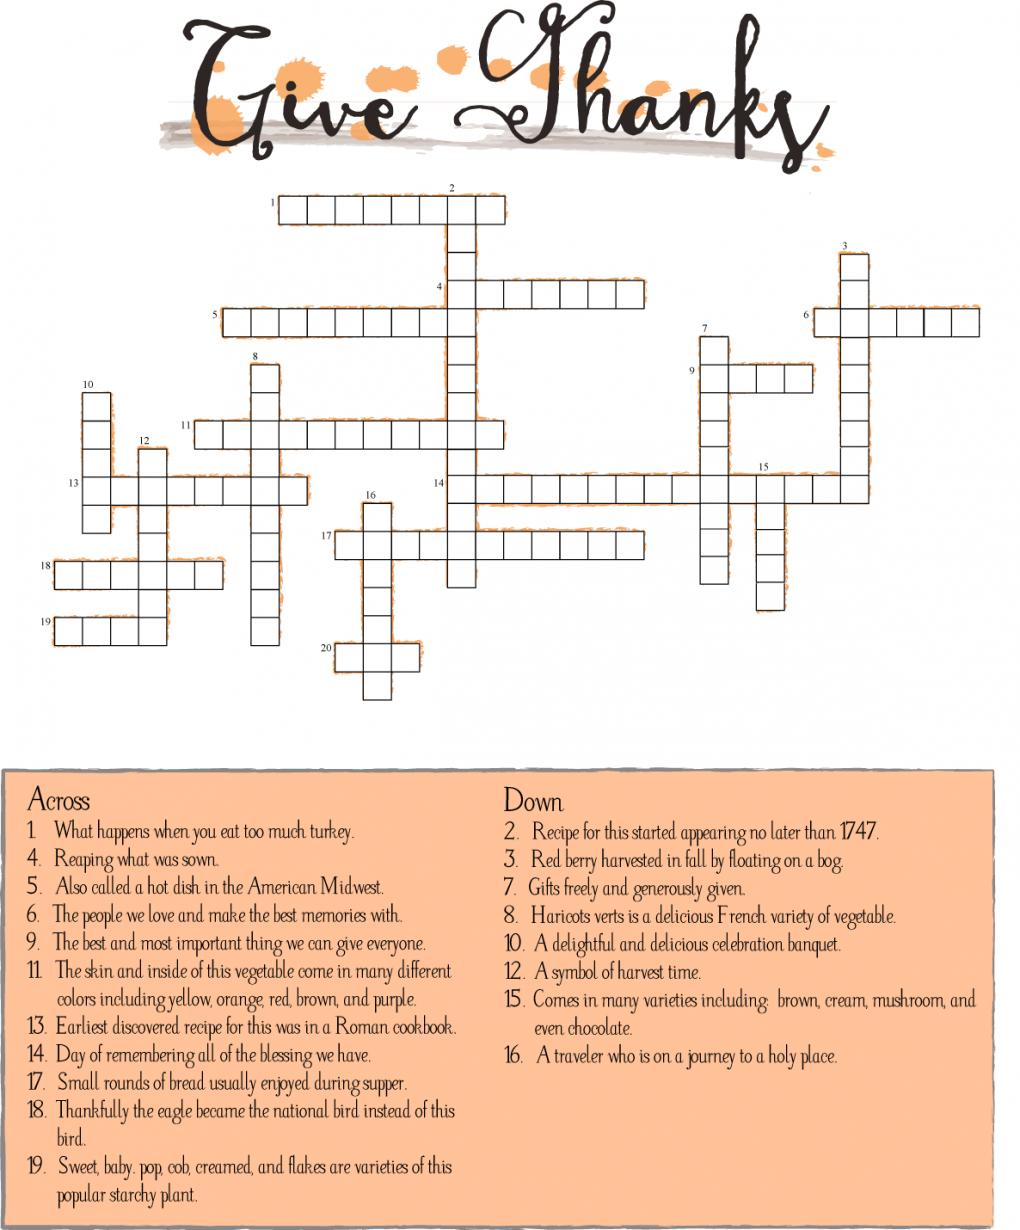 10 Superfun Thanksgiving Crossword Puzzles | Kittybabylove - Printable Crossword Puzzles For Thanksgiving